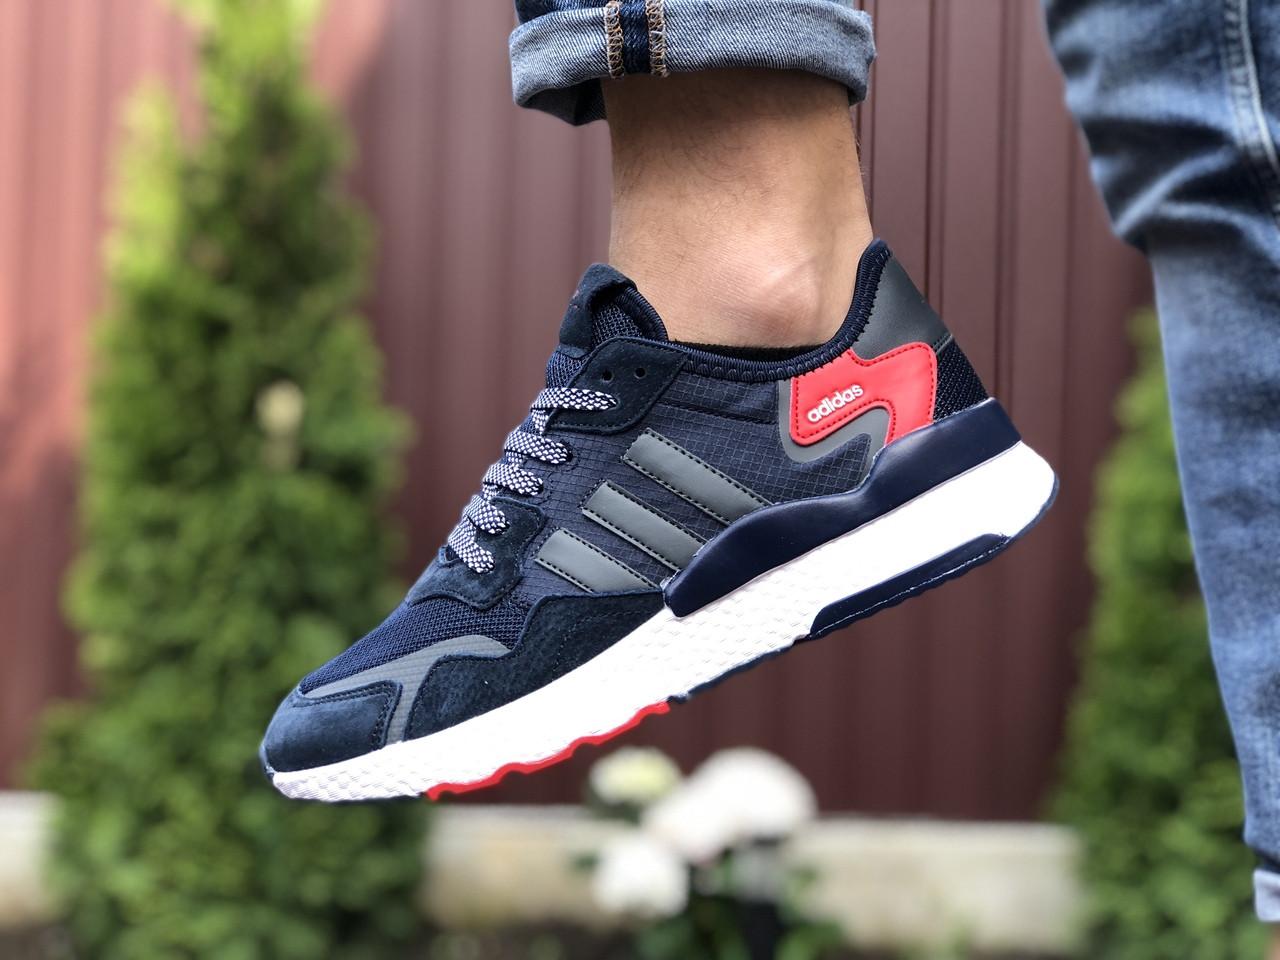 Мужские кроссовки Adidas Nite Jogger (темно-синие) 9370